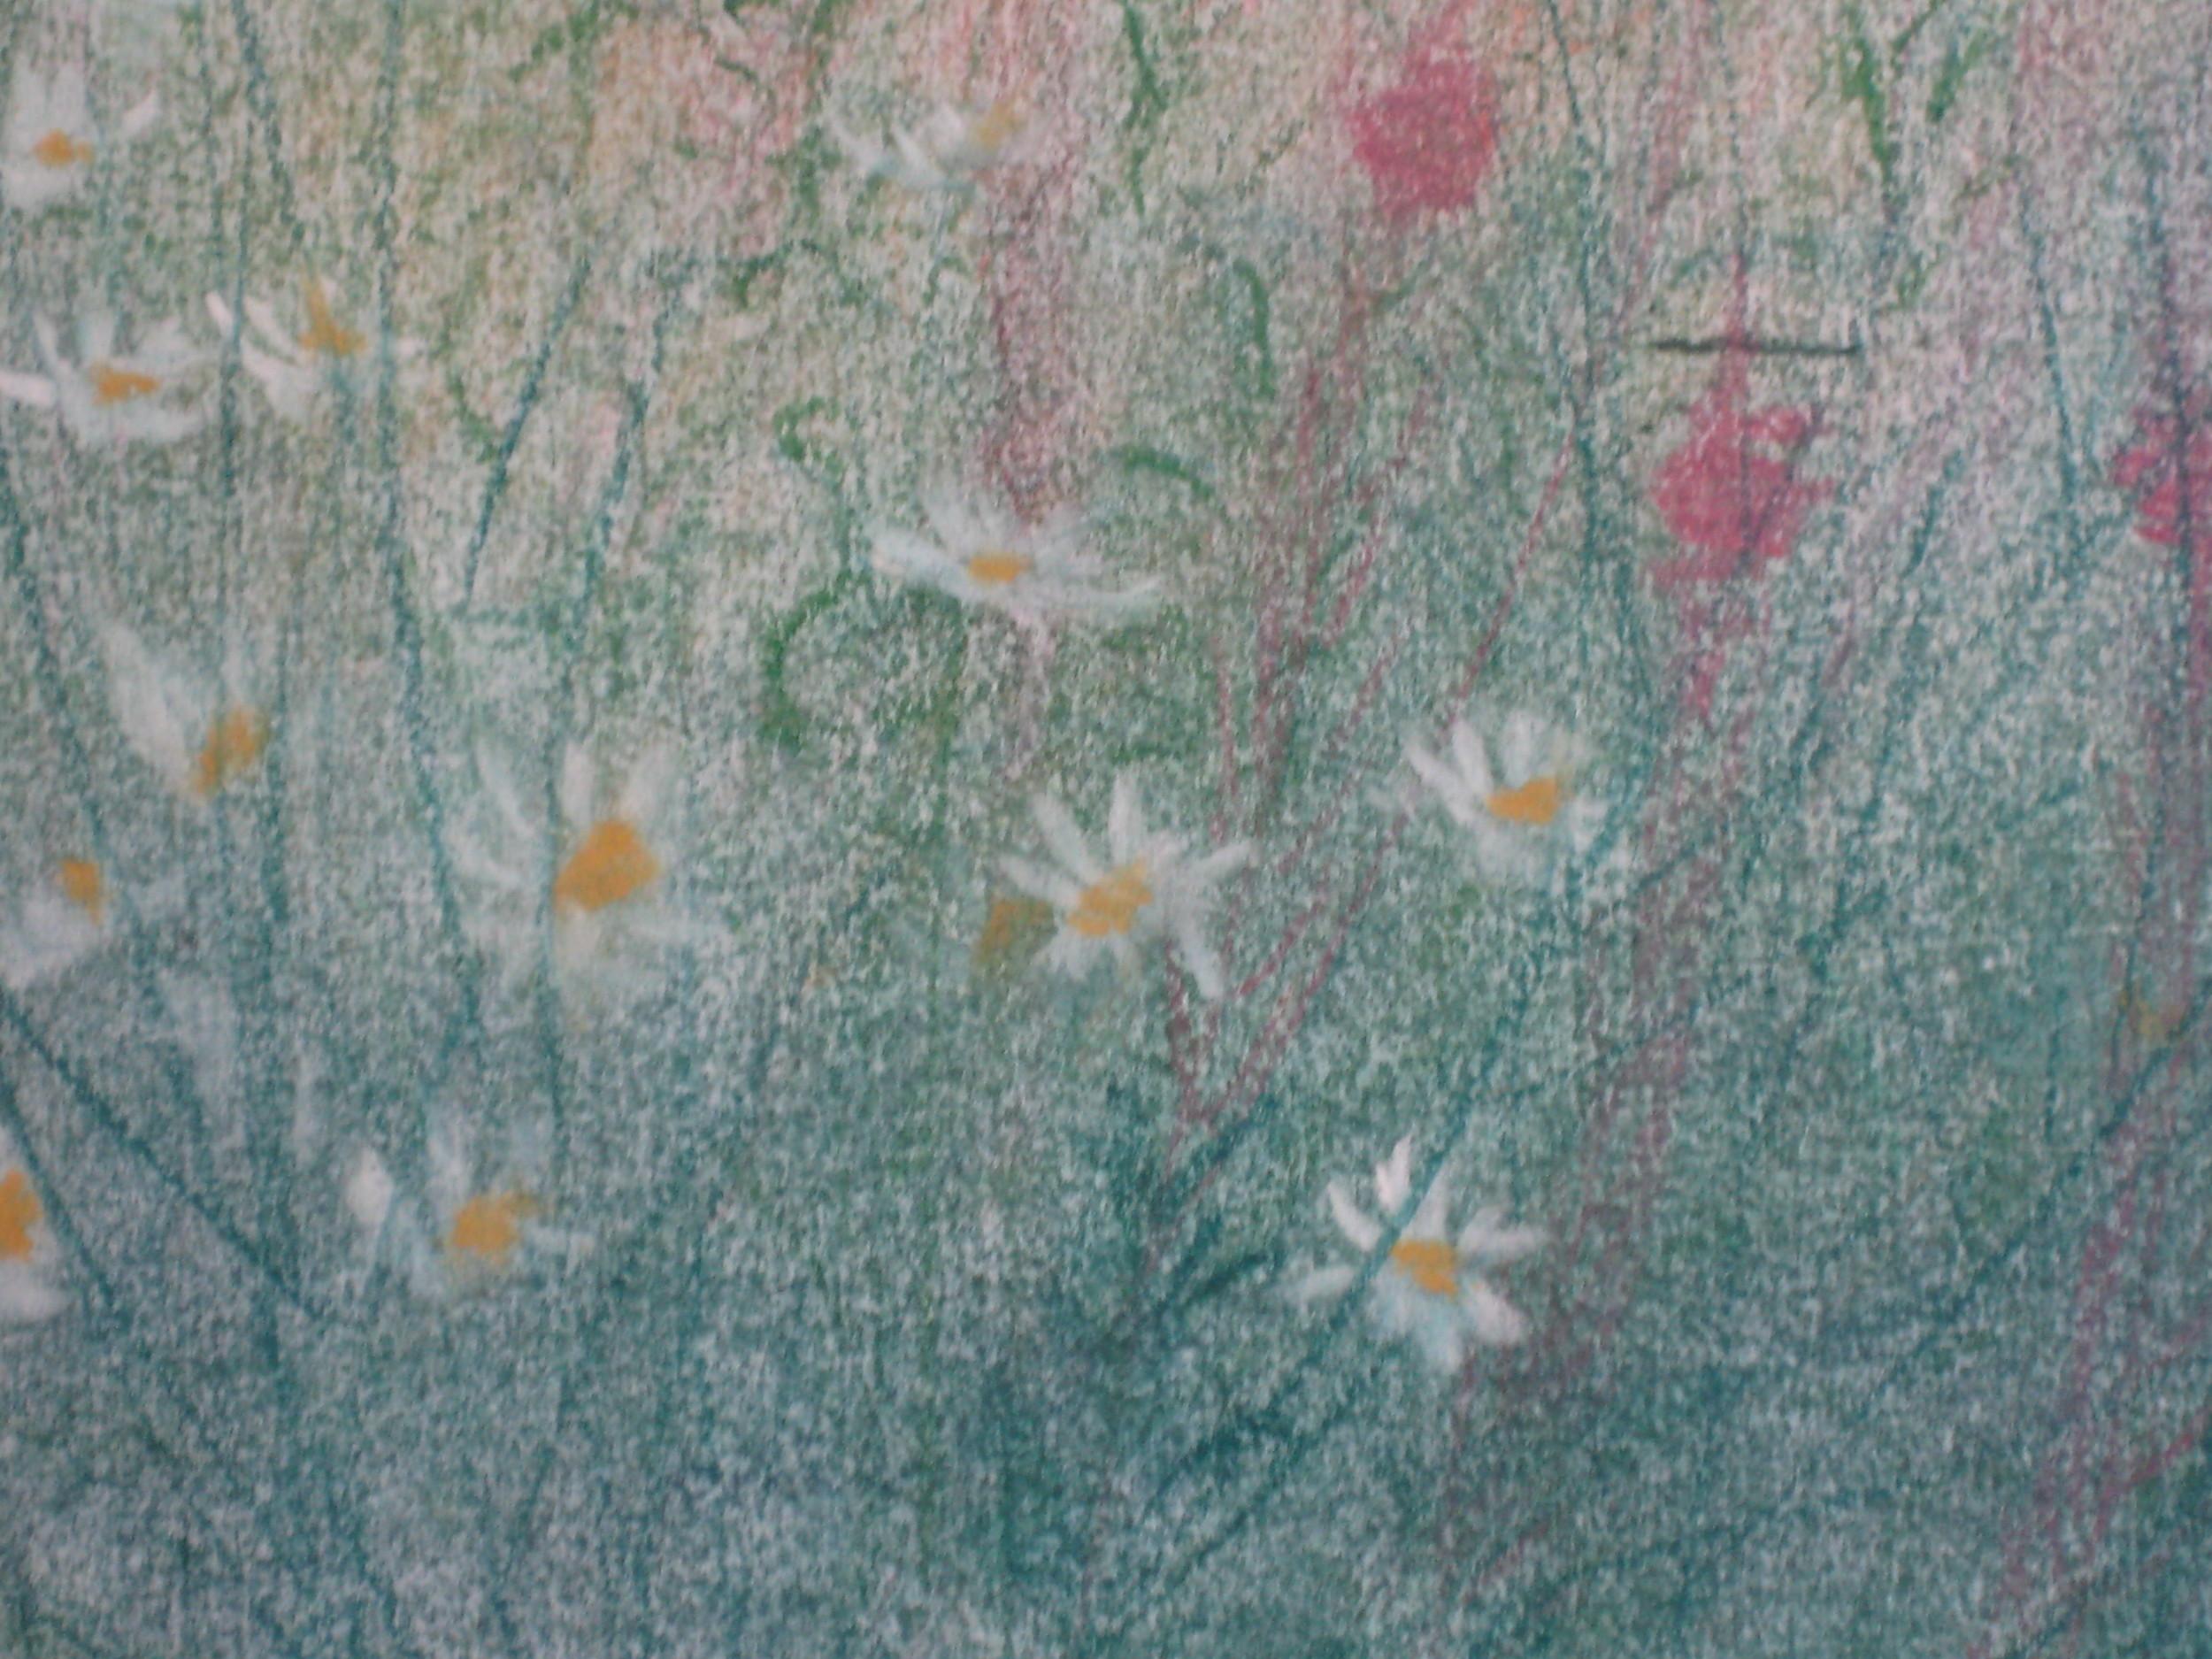 Rosebay willow herb and daisy